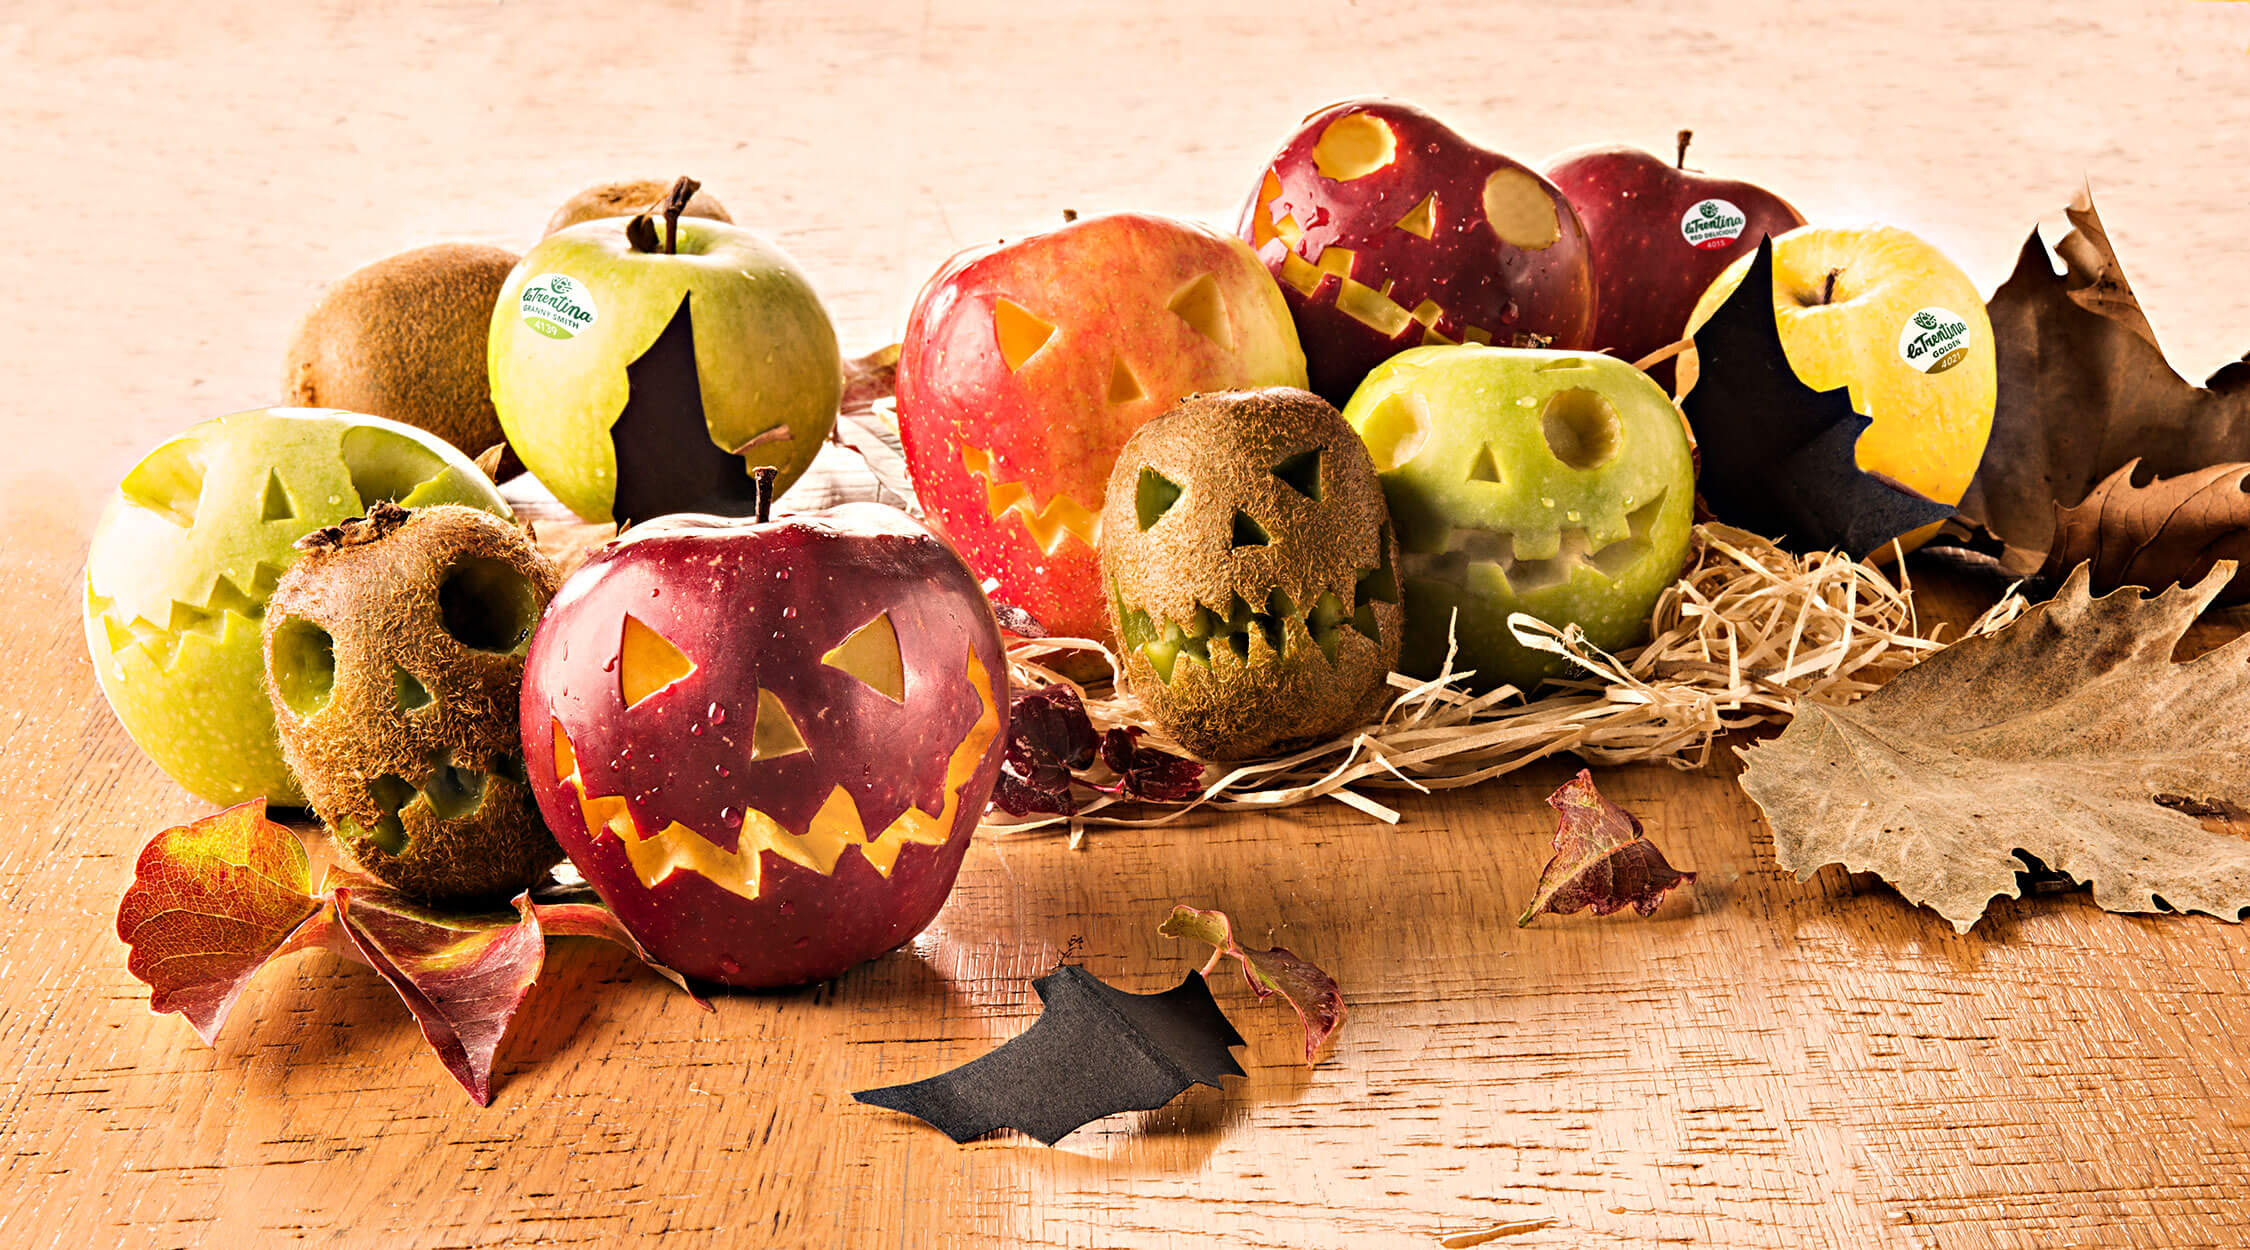 halloween-2020-latrentina-mele-paurose (1)